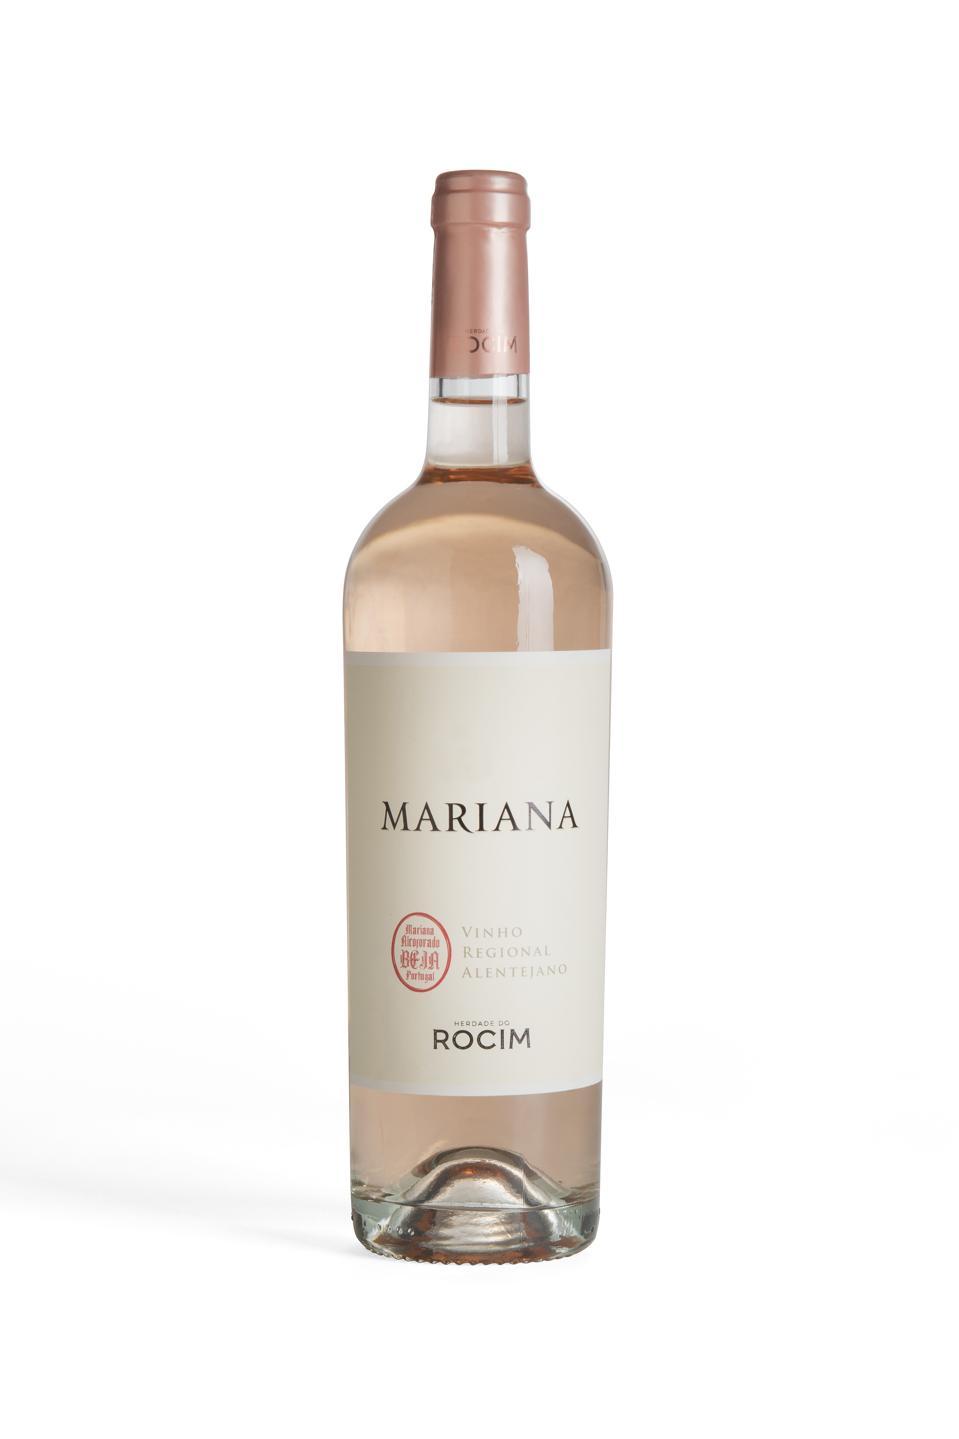 Bottle of Herdad do Rocim Mariana rosé wine